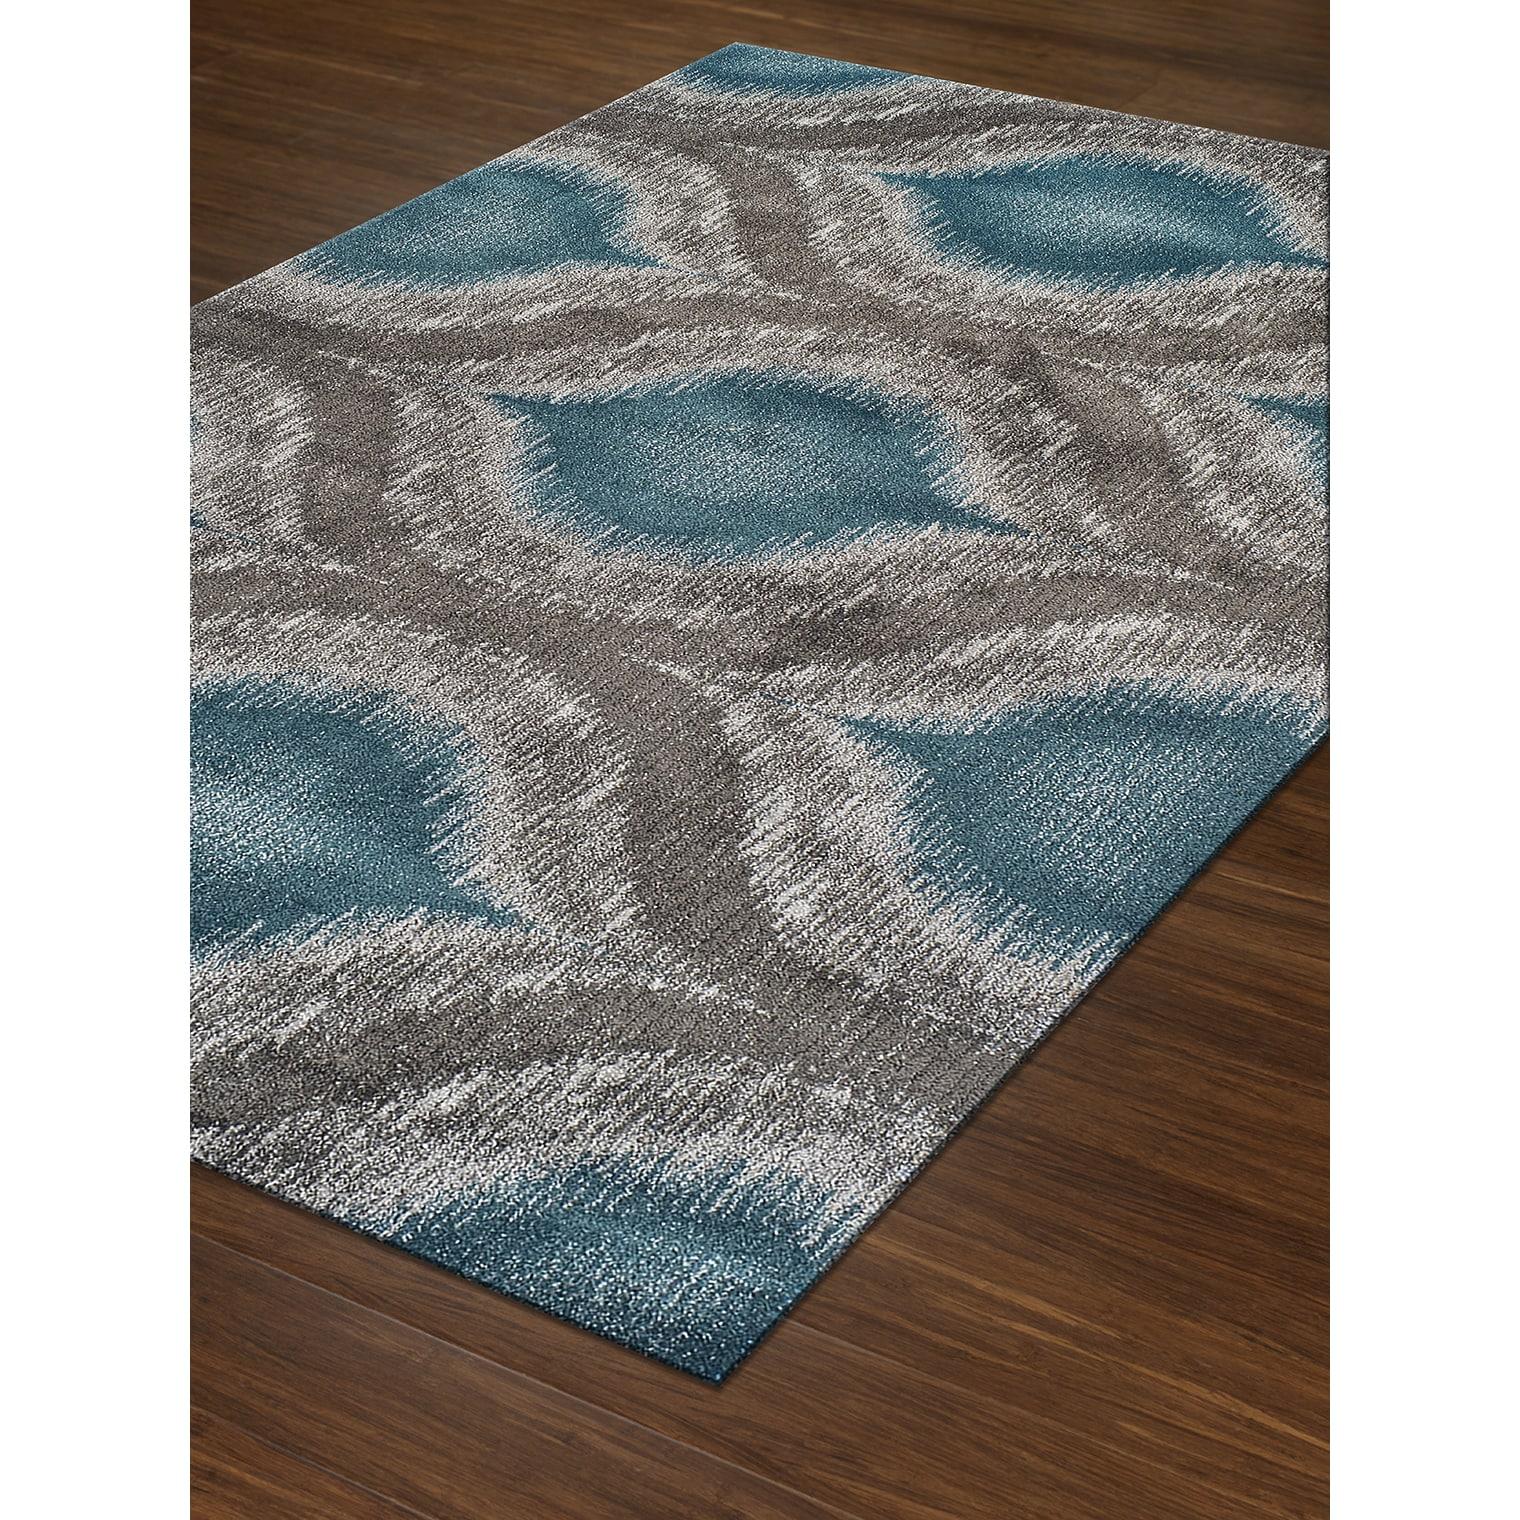 peacock mat foam memory runner royal set tables rugs walmart light click blue admiral expand rug coffee bathtub to lighting cobalt bathroom bath